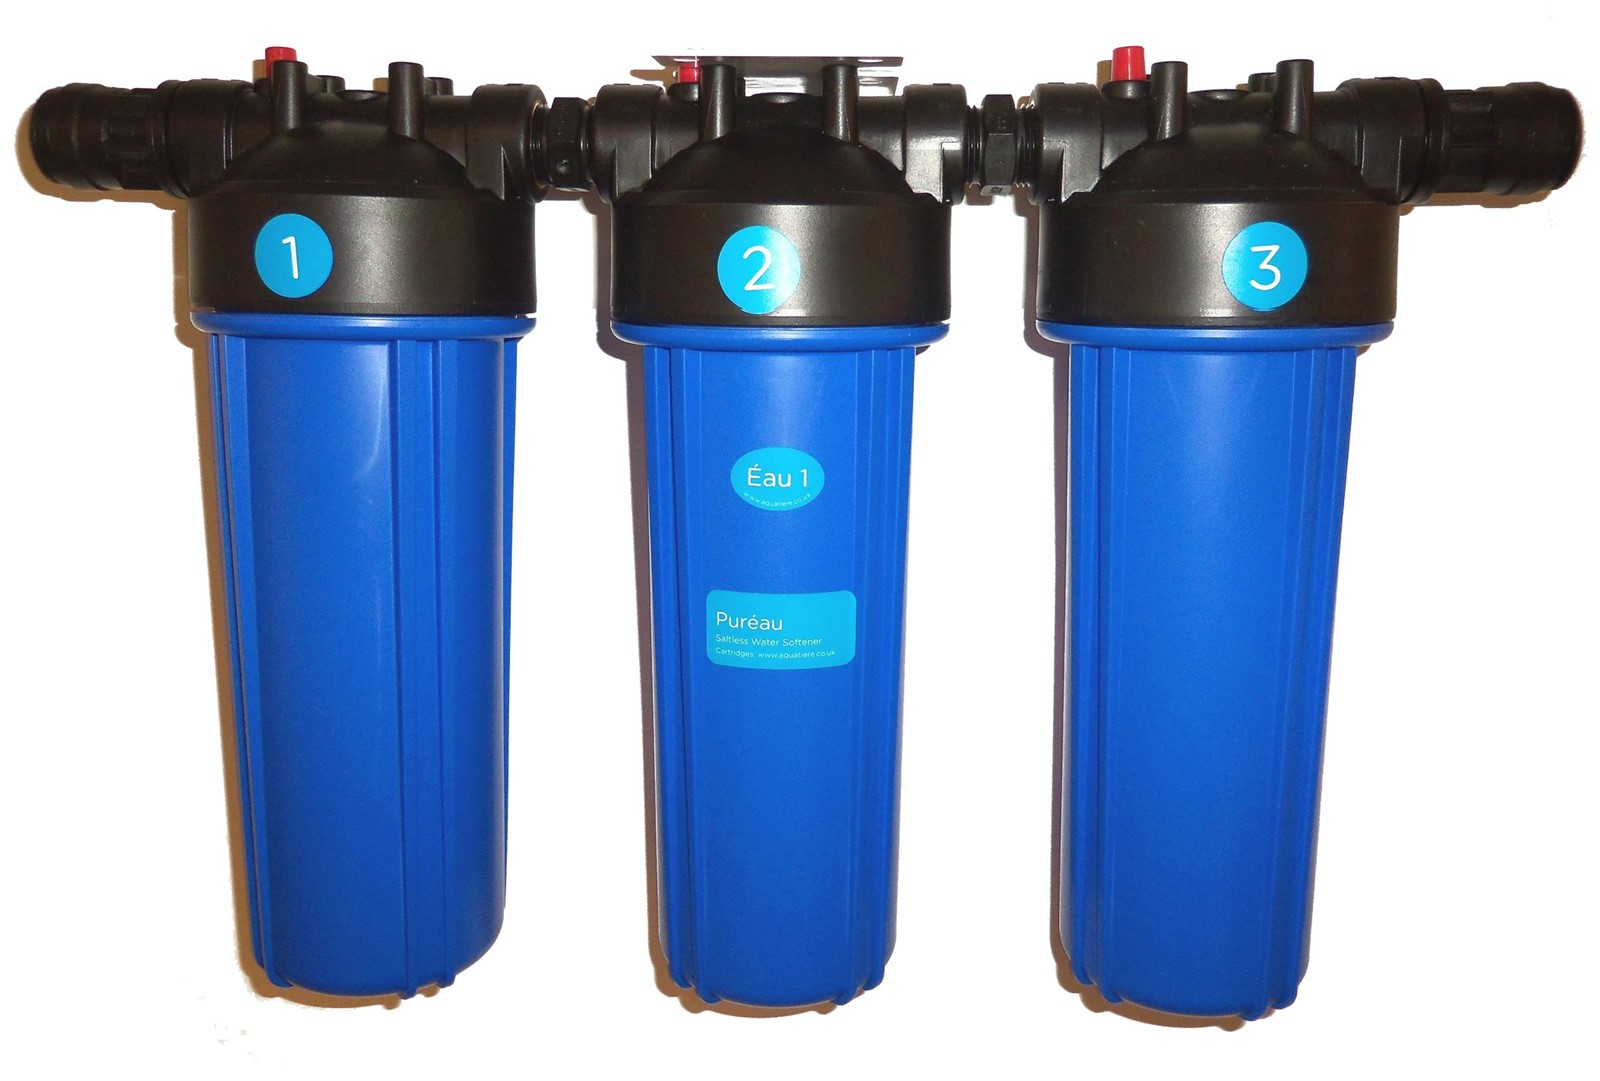 Aquatiere Eau1 Pureau Whole House Water Filter Amp Salt Free